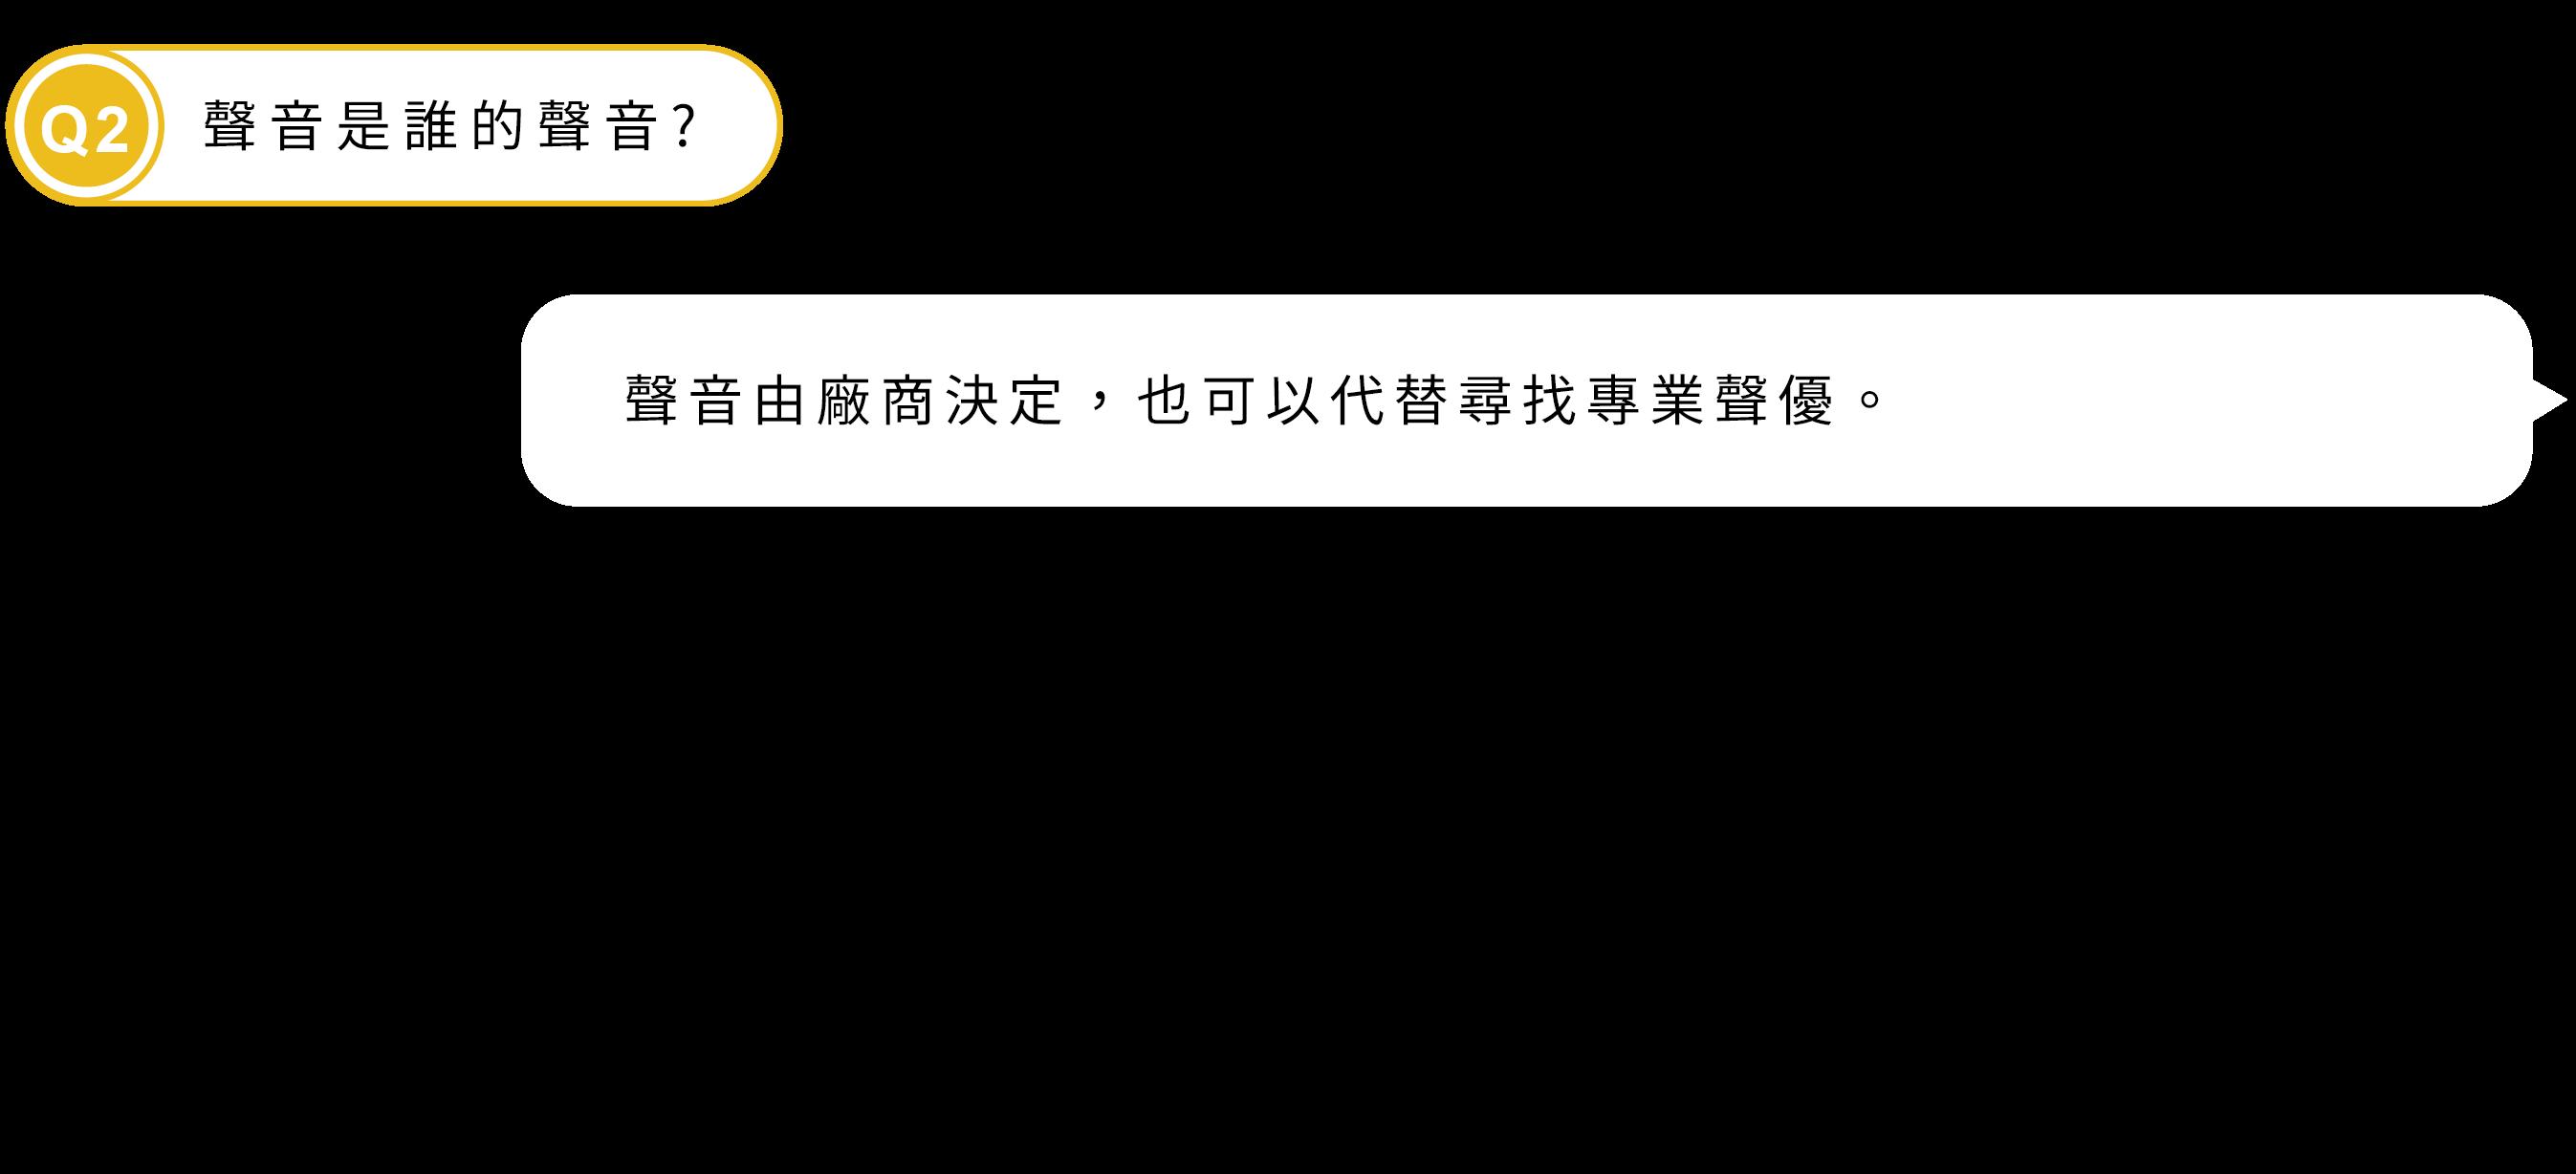 Q2-12 (2)